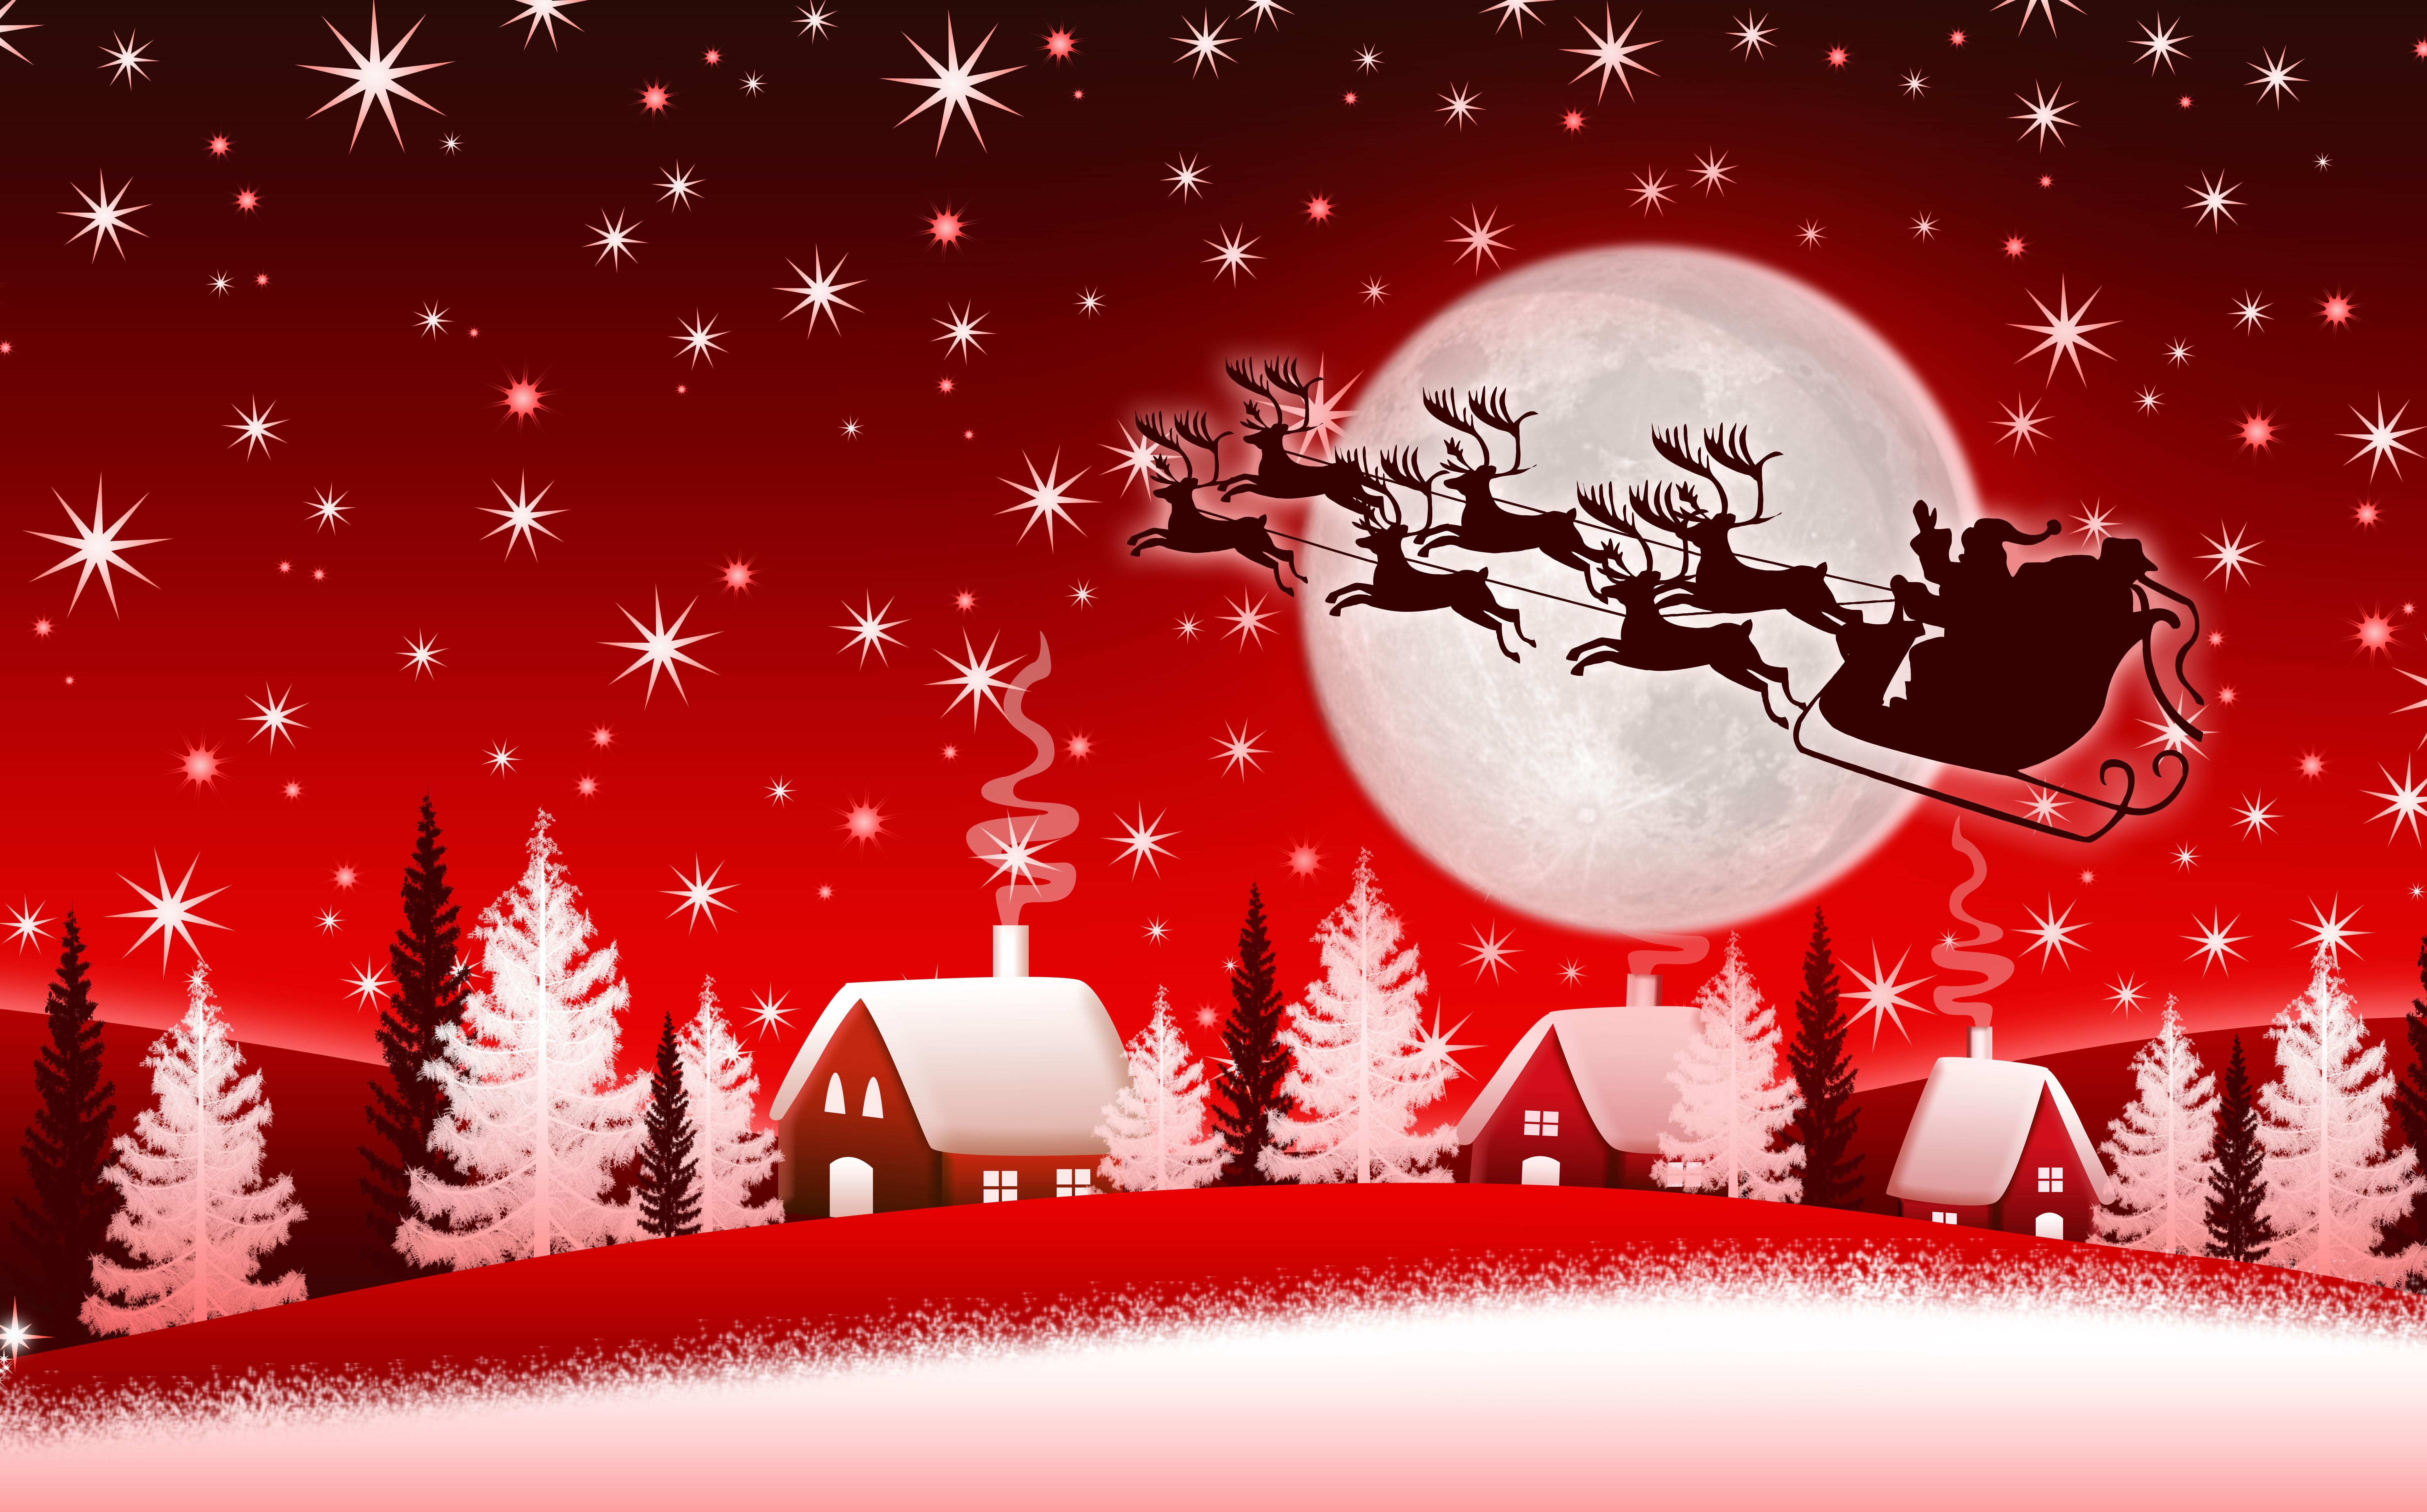 roblox christmas background 1920x1080 - photo #44